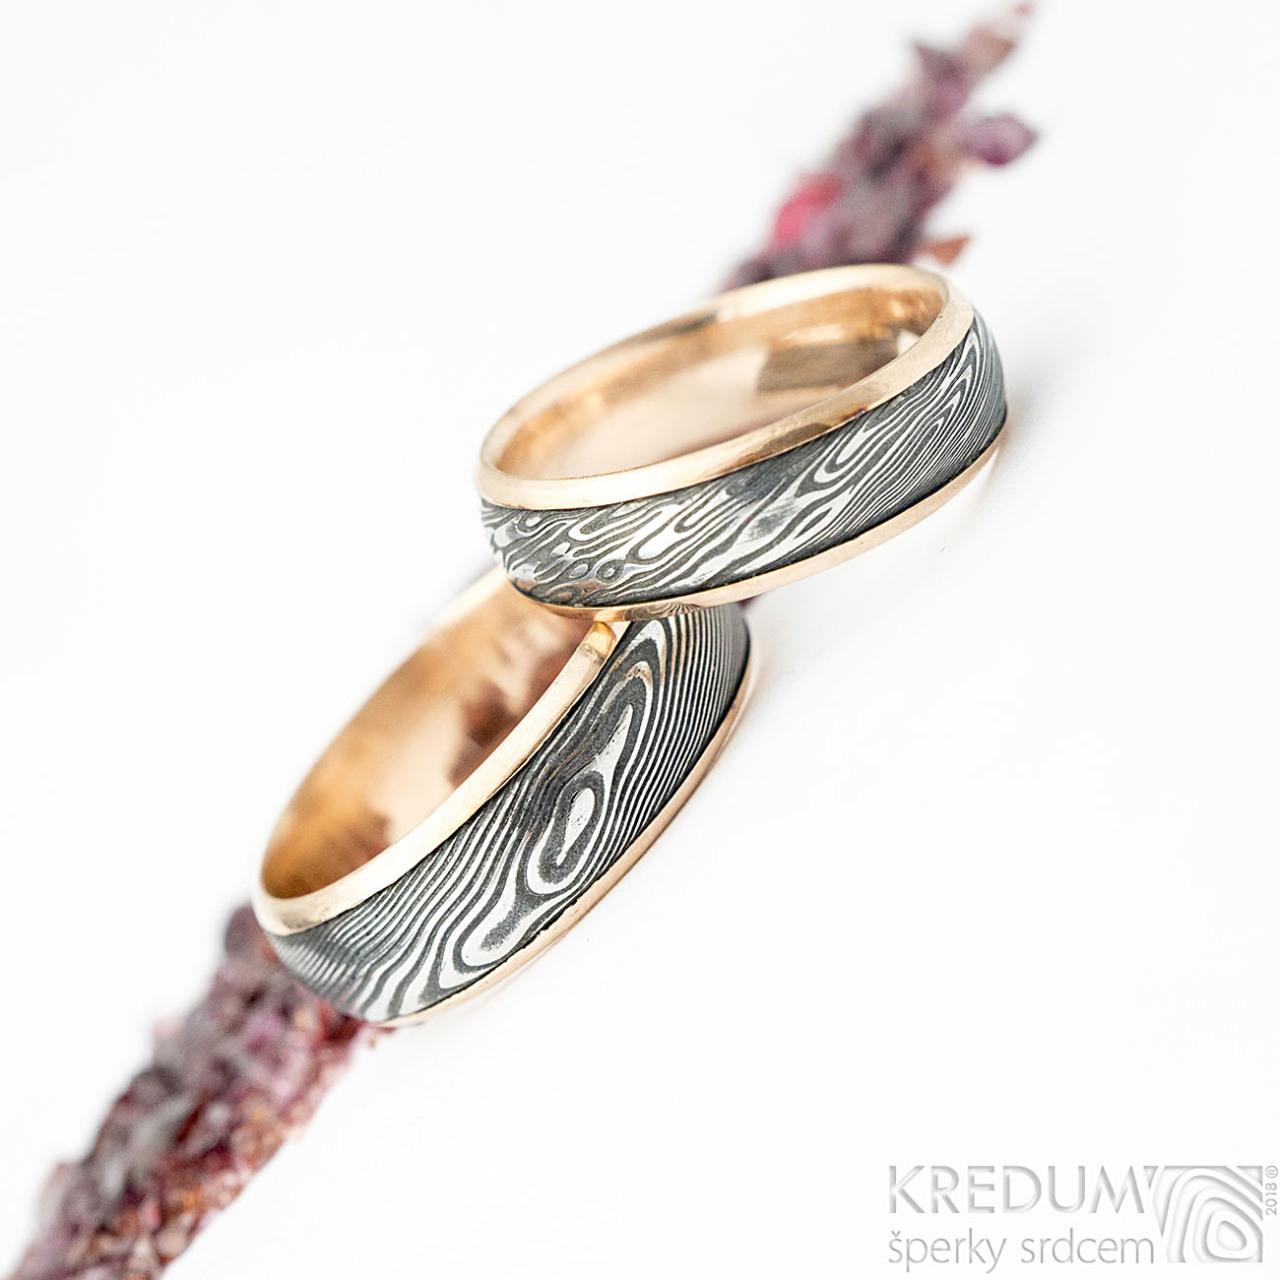 Kasiopea Red Voda Zlate Snubni Prsteny A Damasteel Vyroba Hand